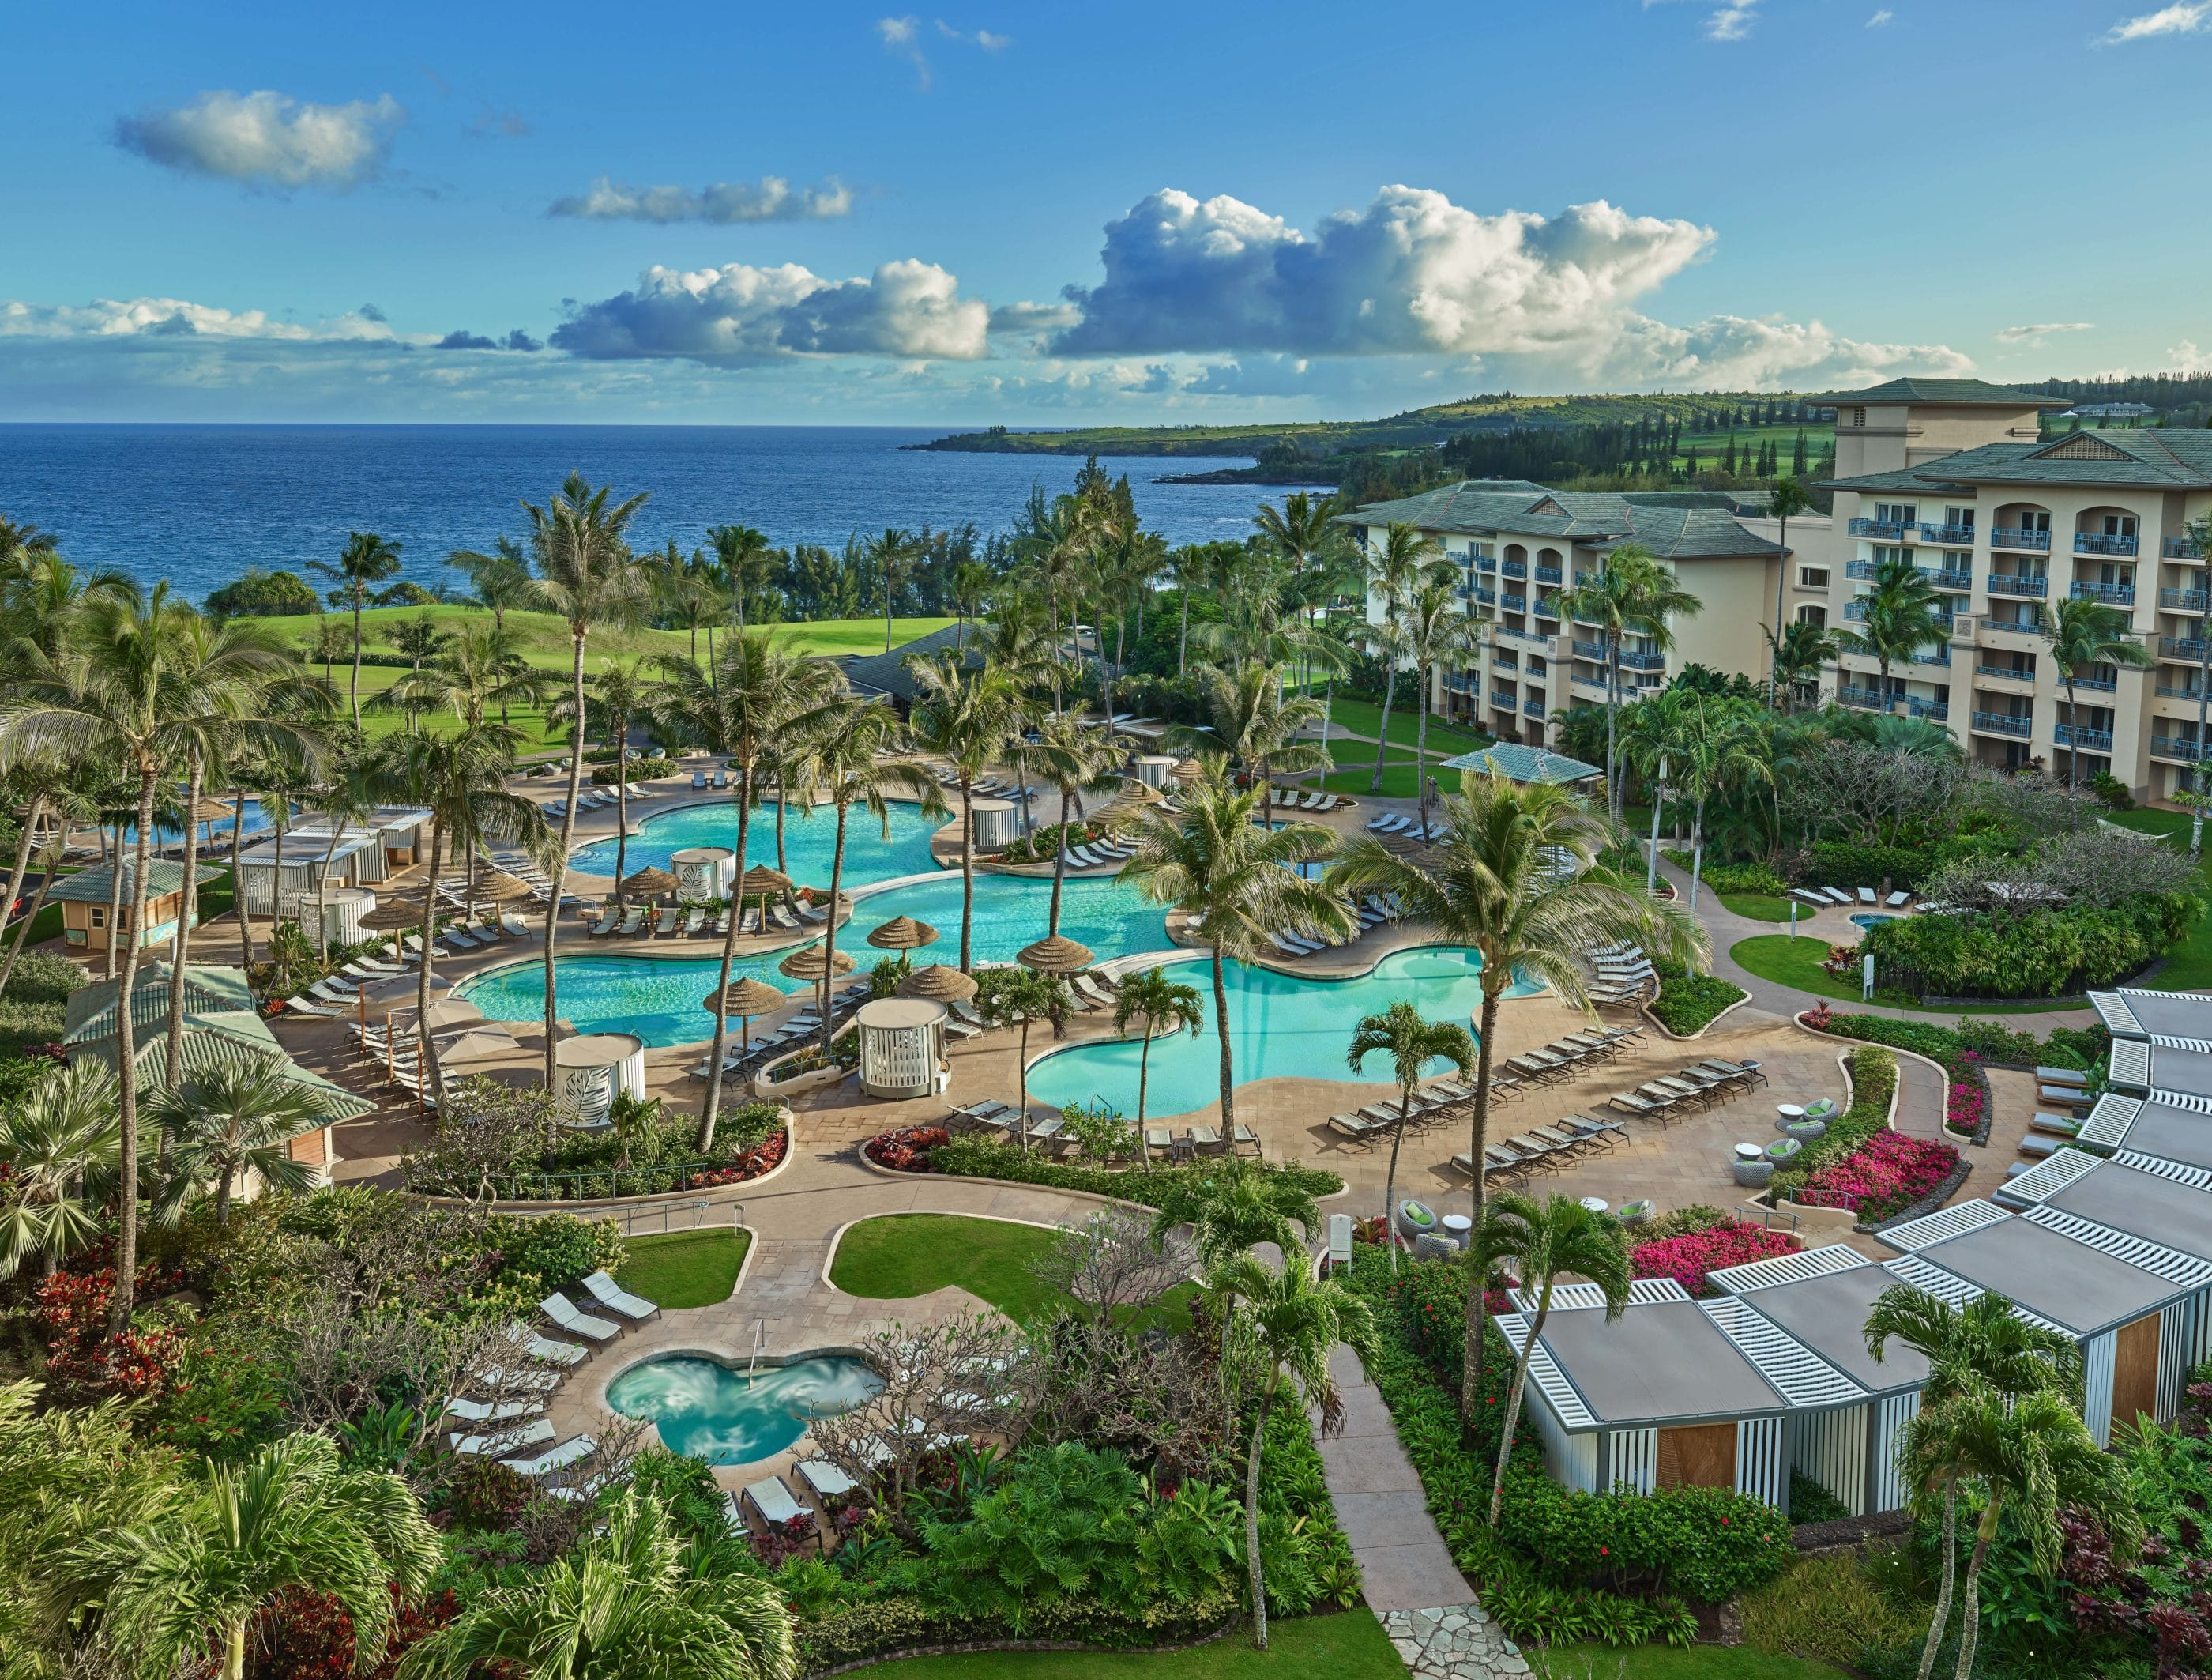 Best Maui hotels: The Ritz-Carlton, Kapalua Maui hotel